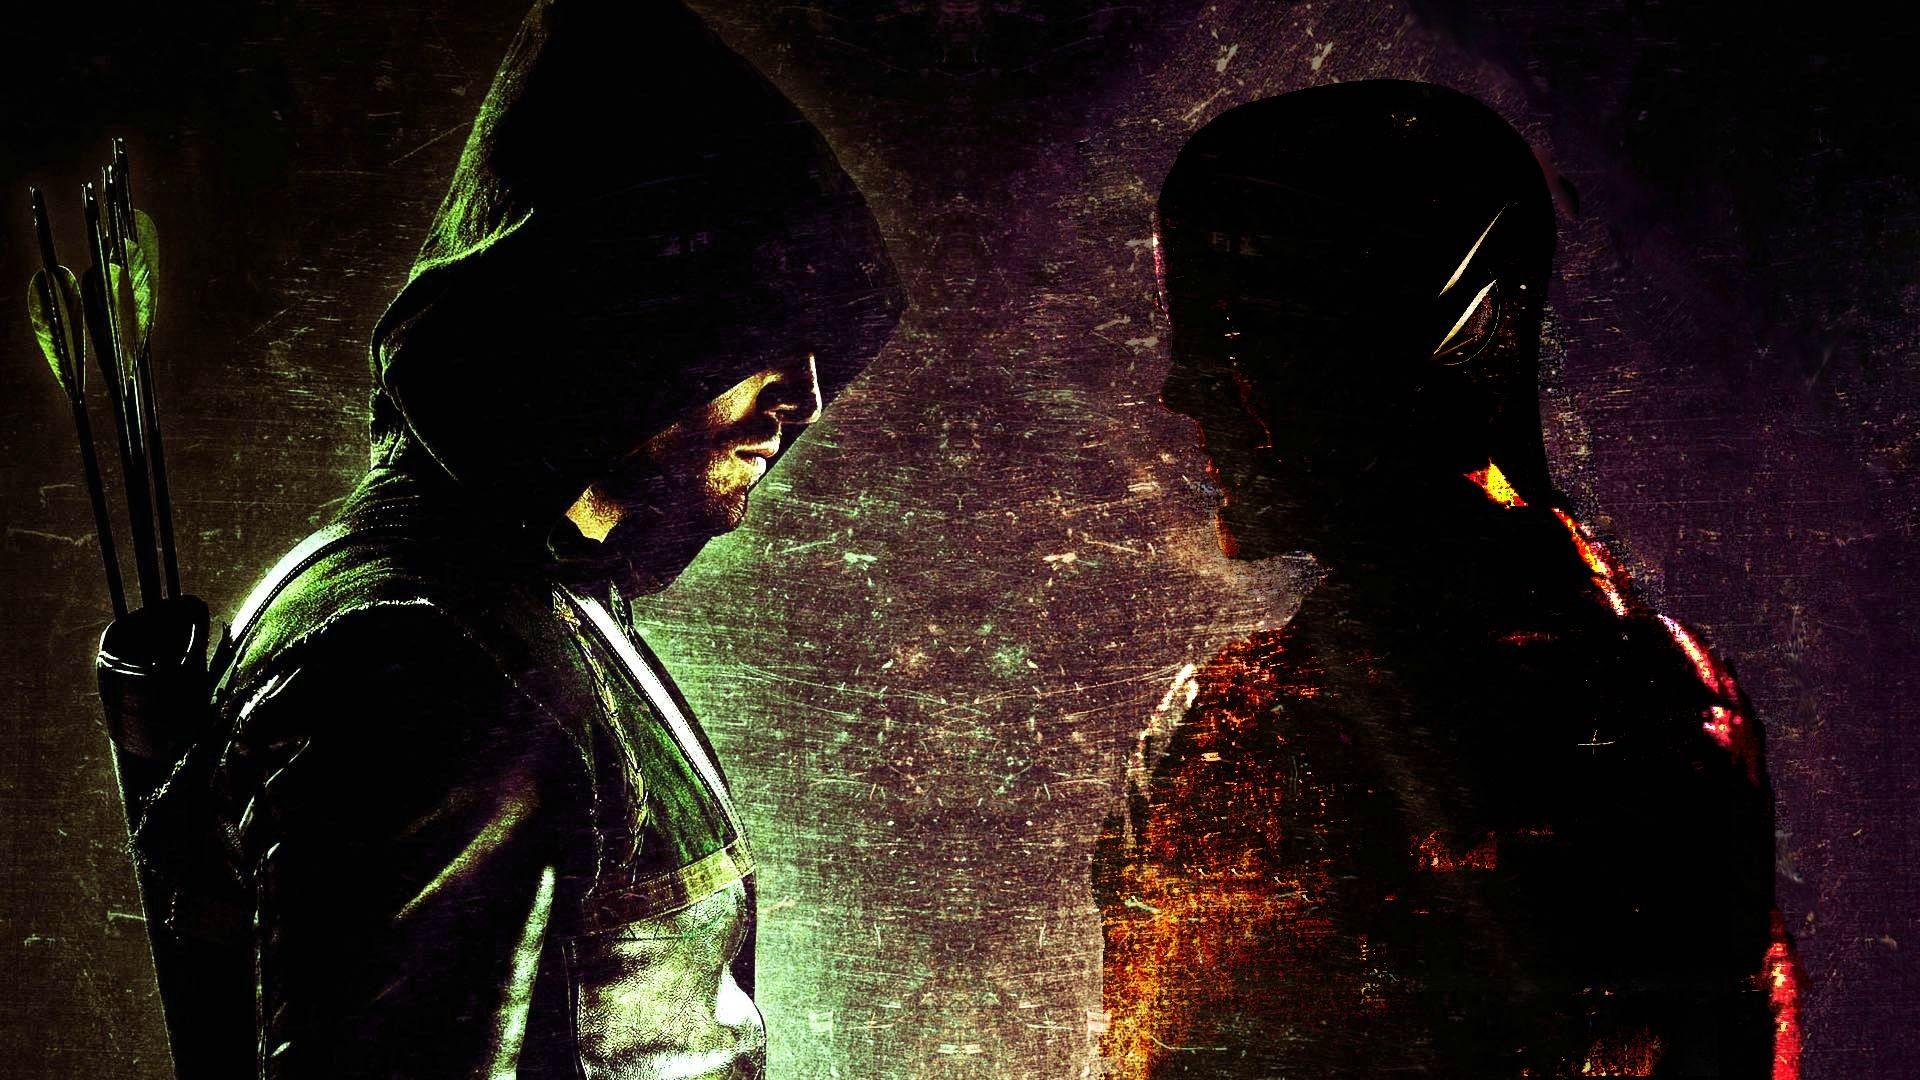 The Flash vs Green Arrow